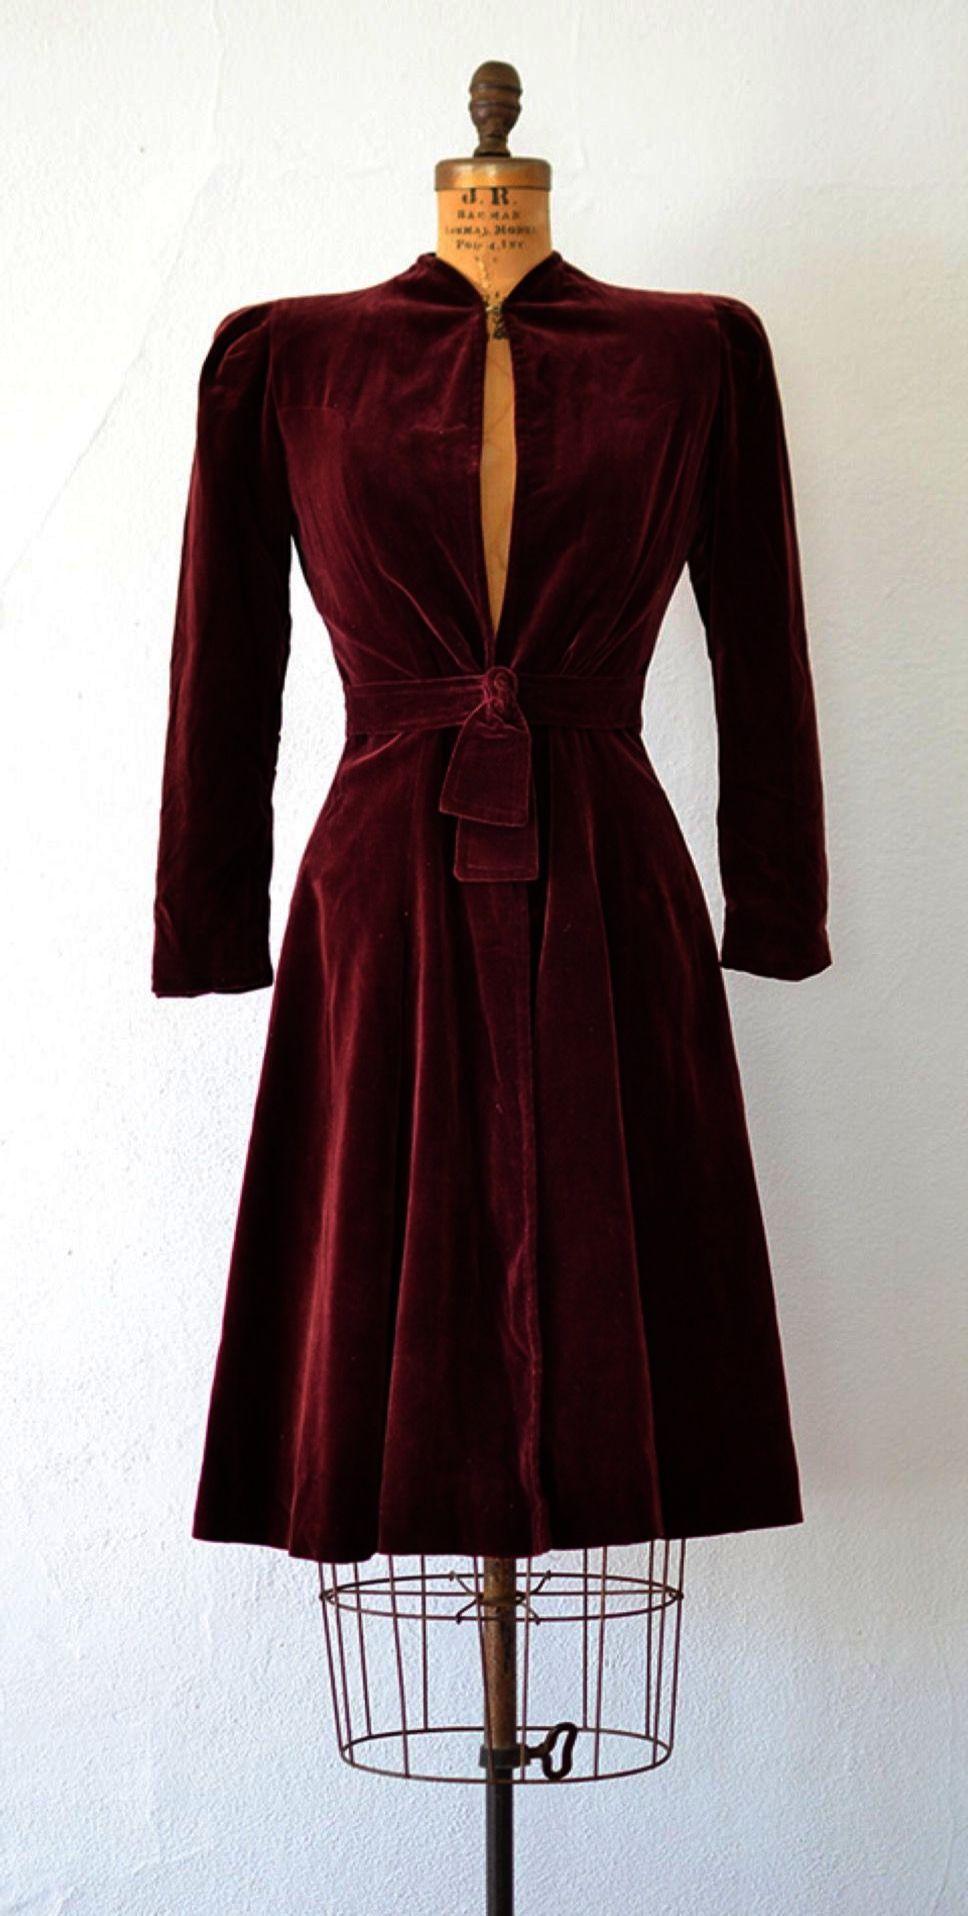 S style rose dress s style disney dress vintage s dresses